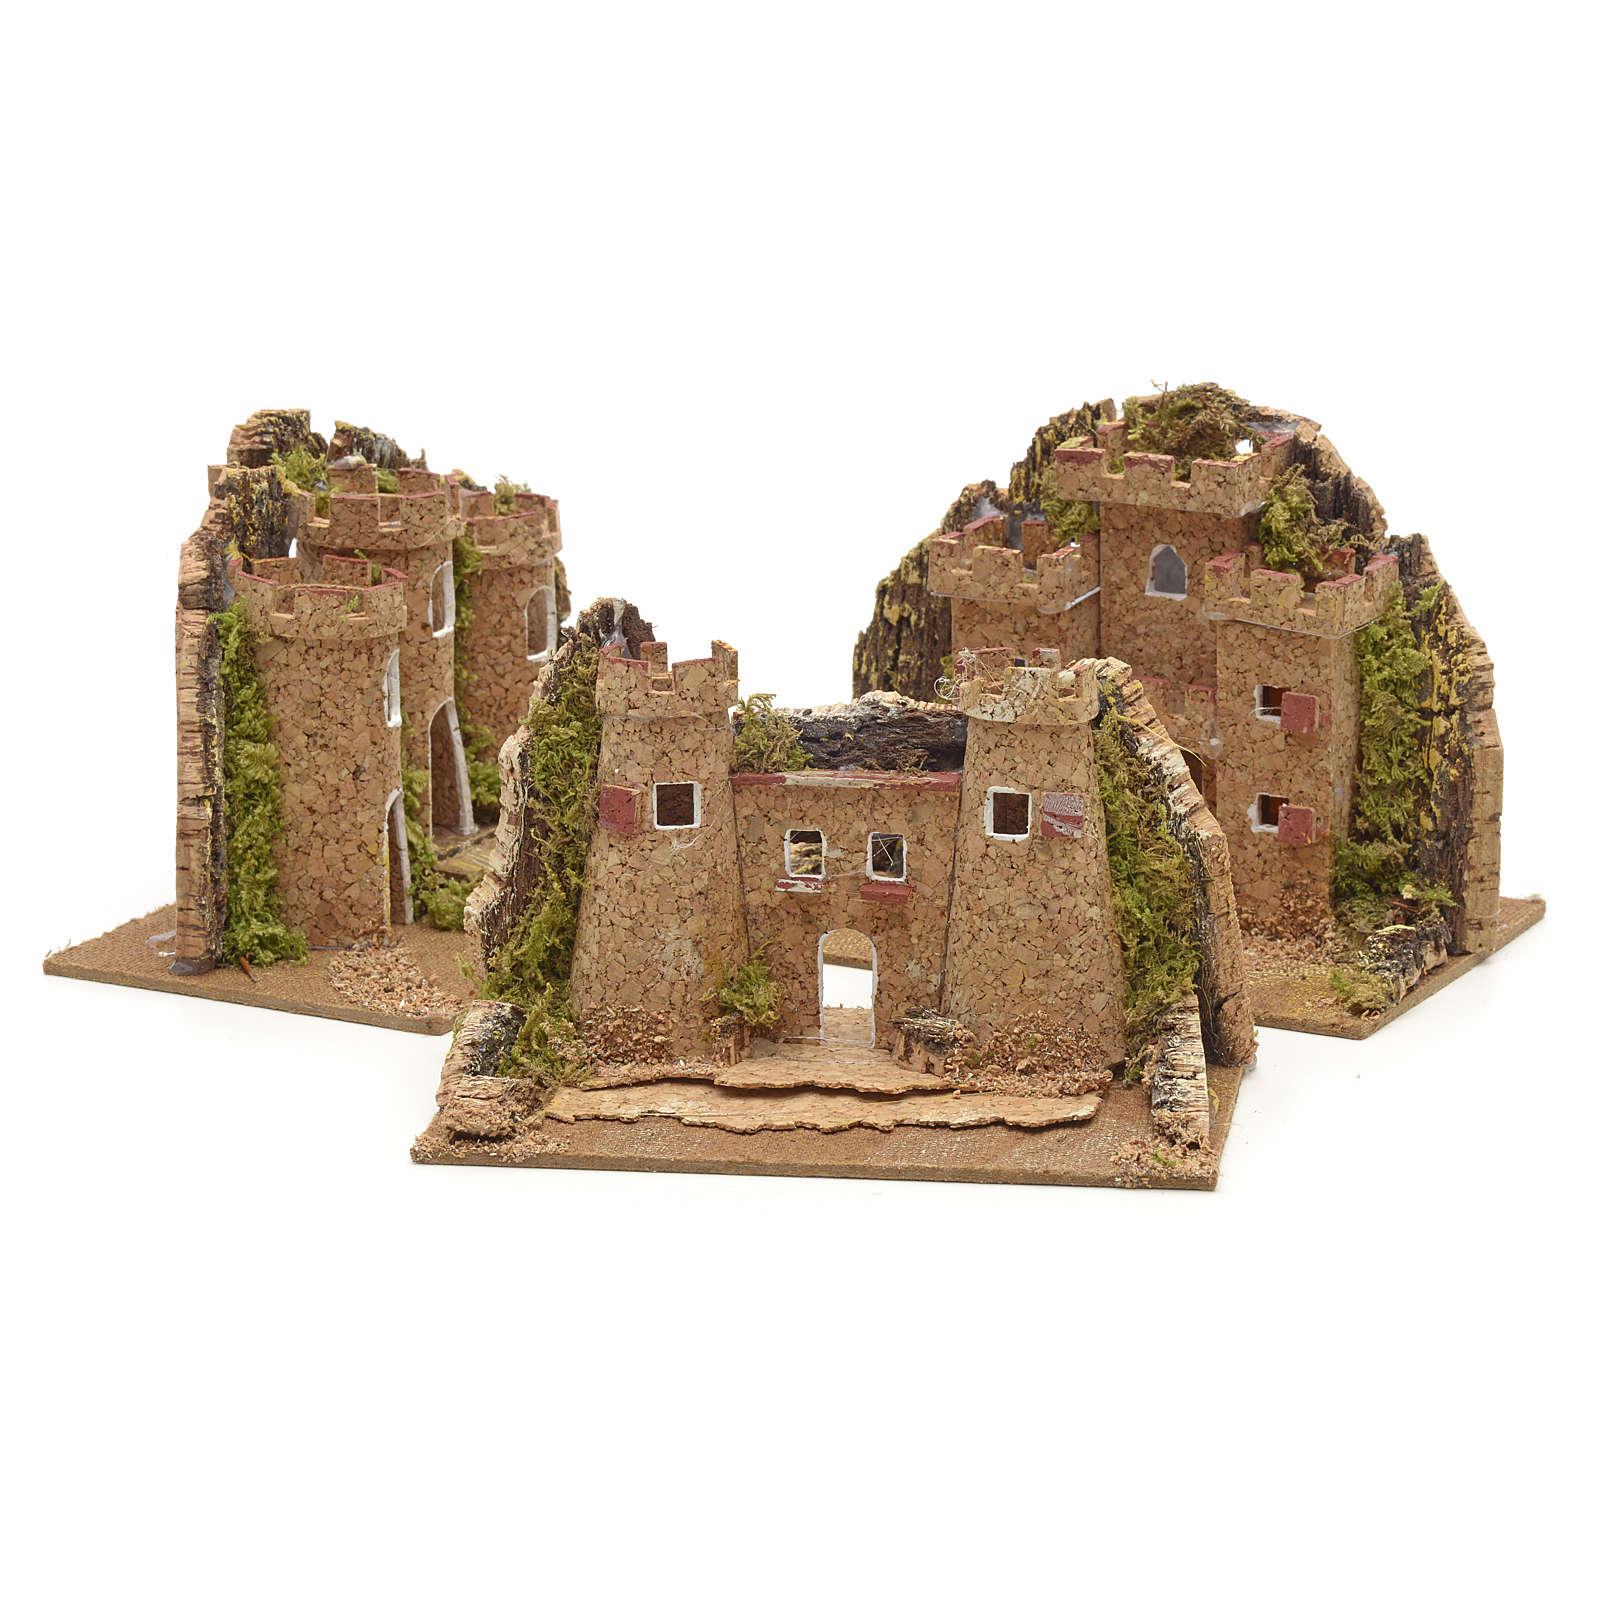 Castello presepe 15x10 4